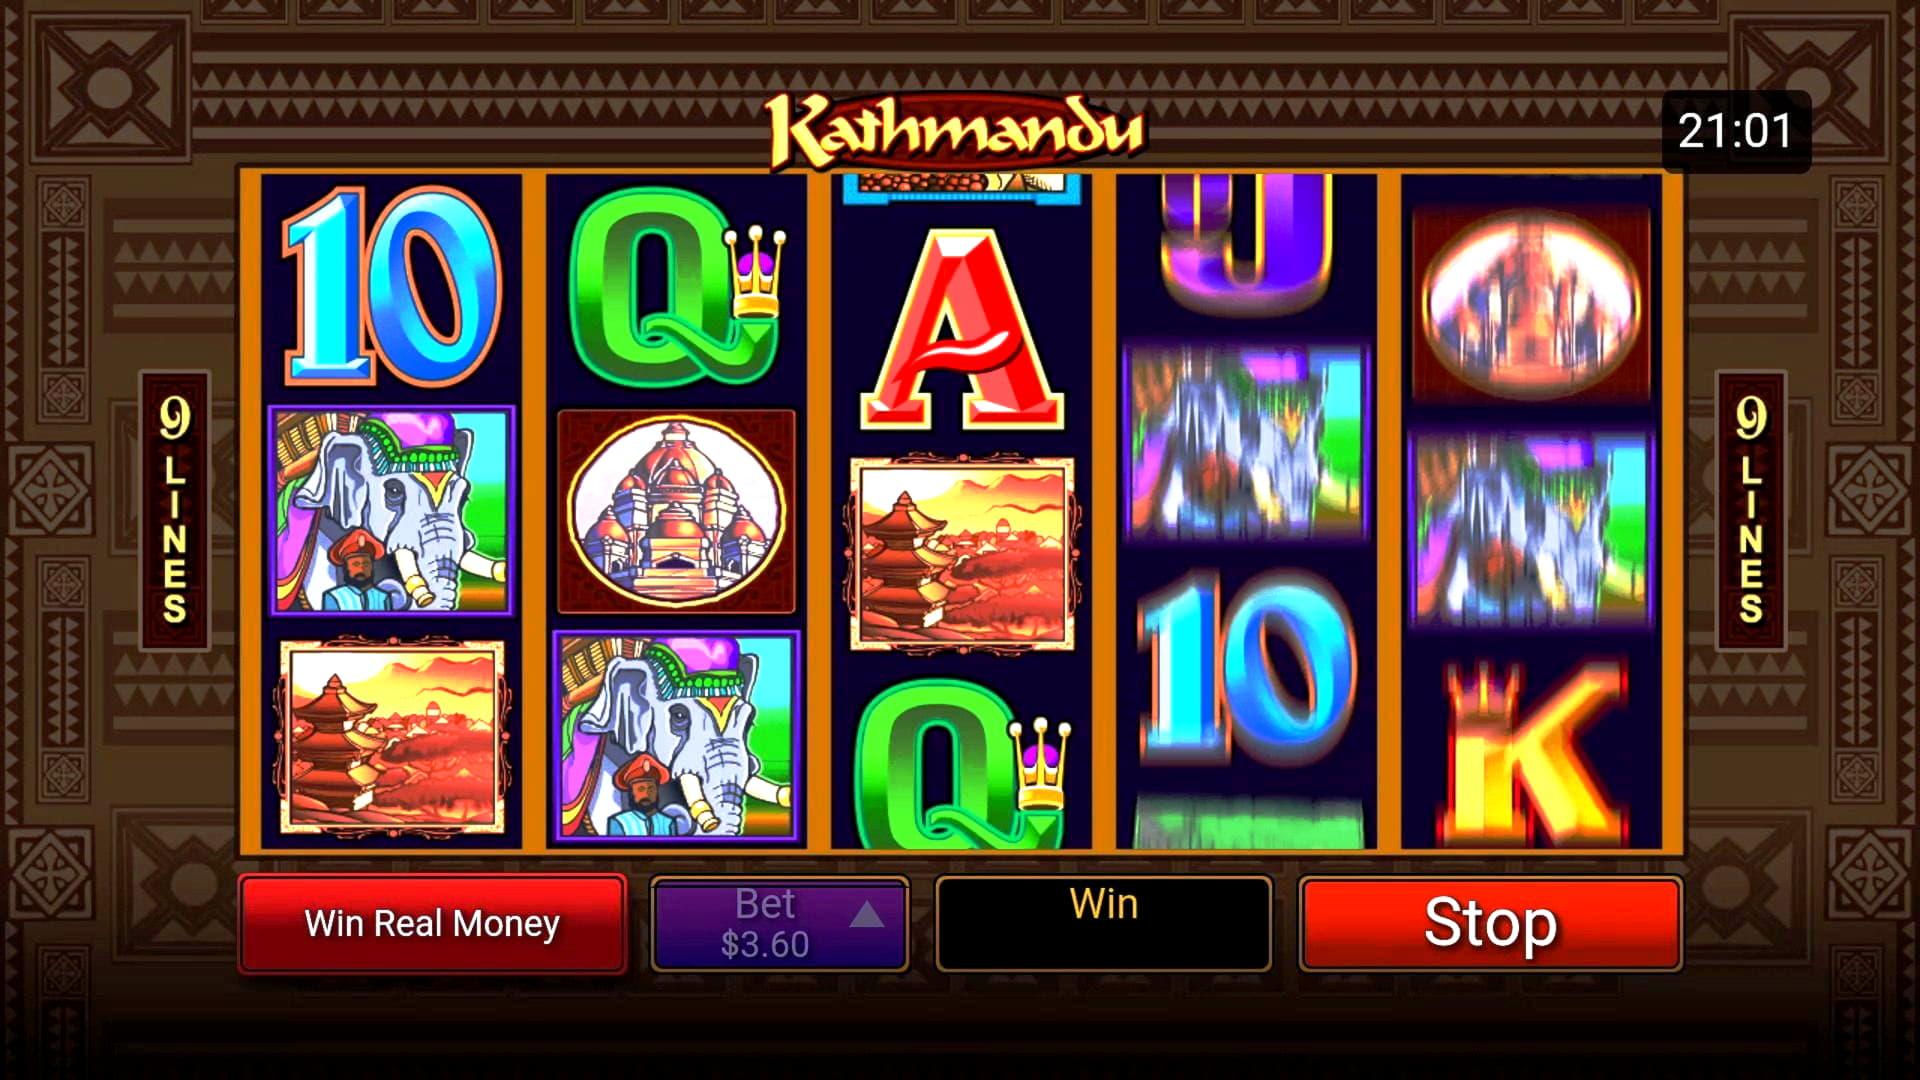 Free Play Casino No Deposit